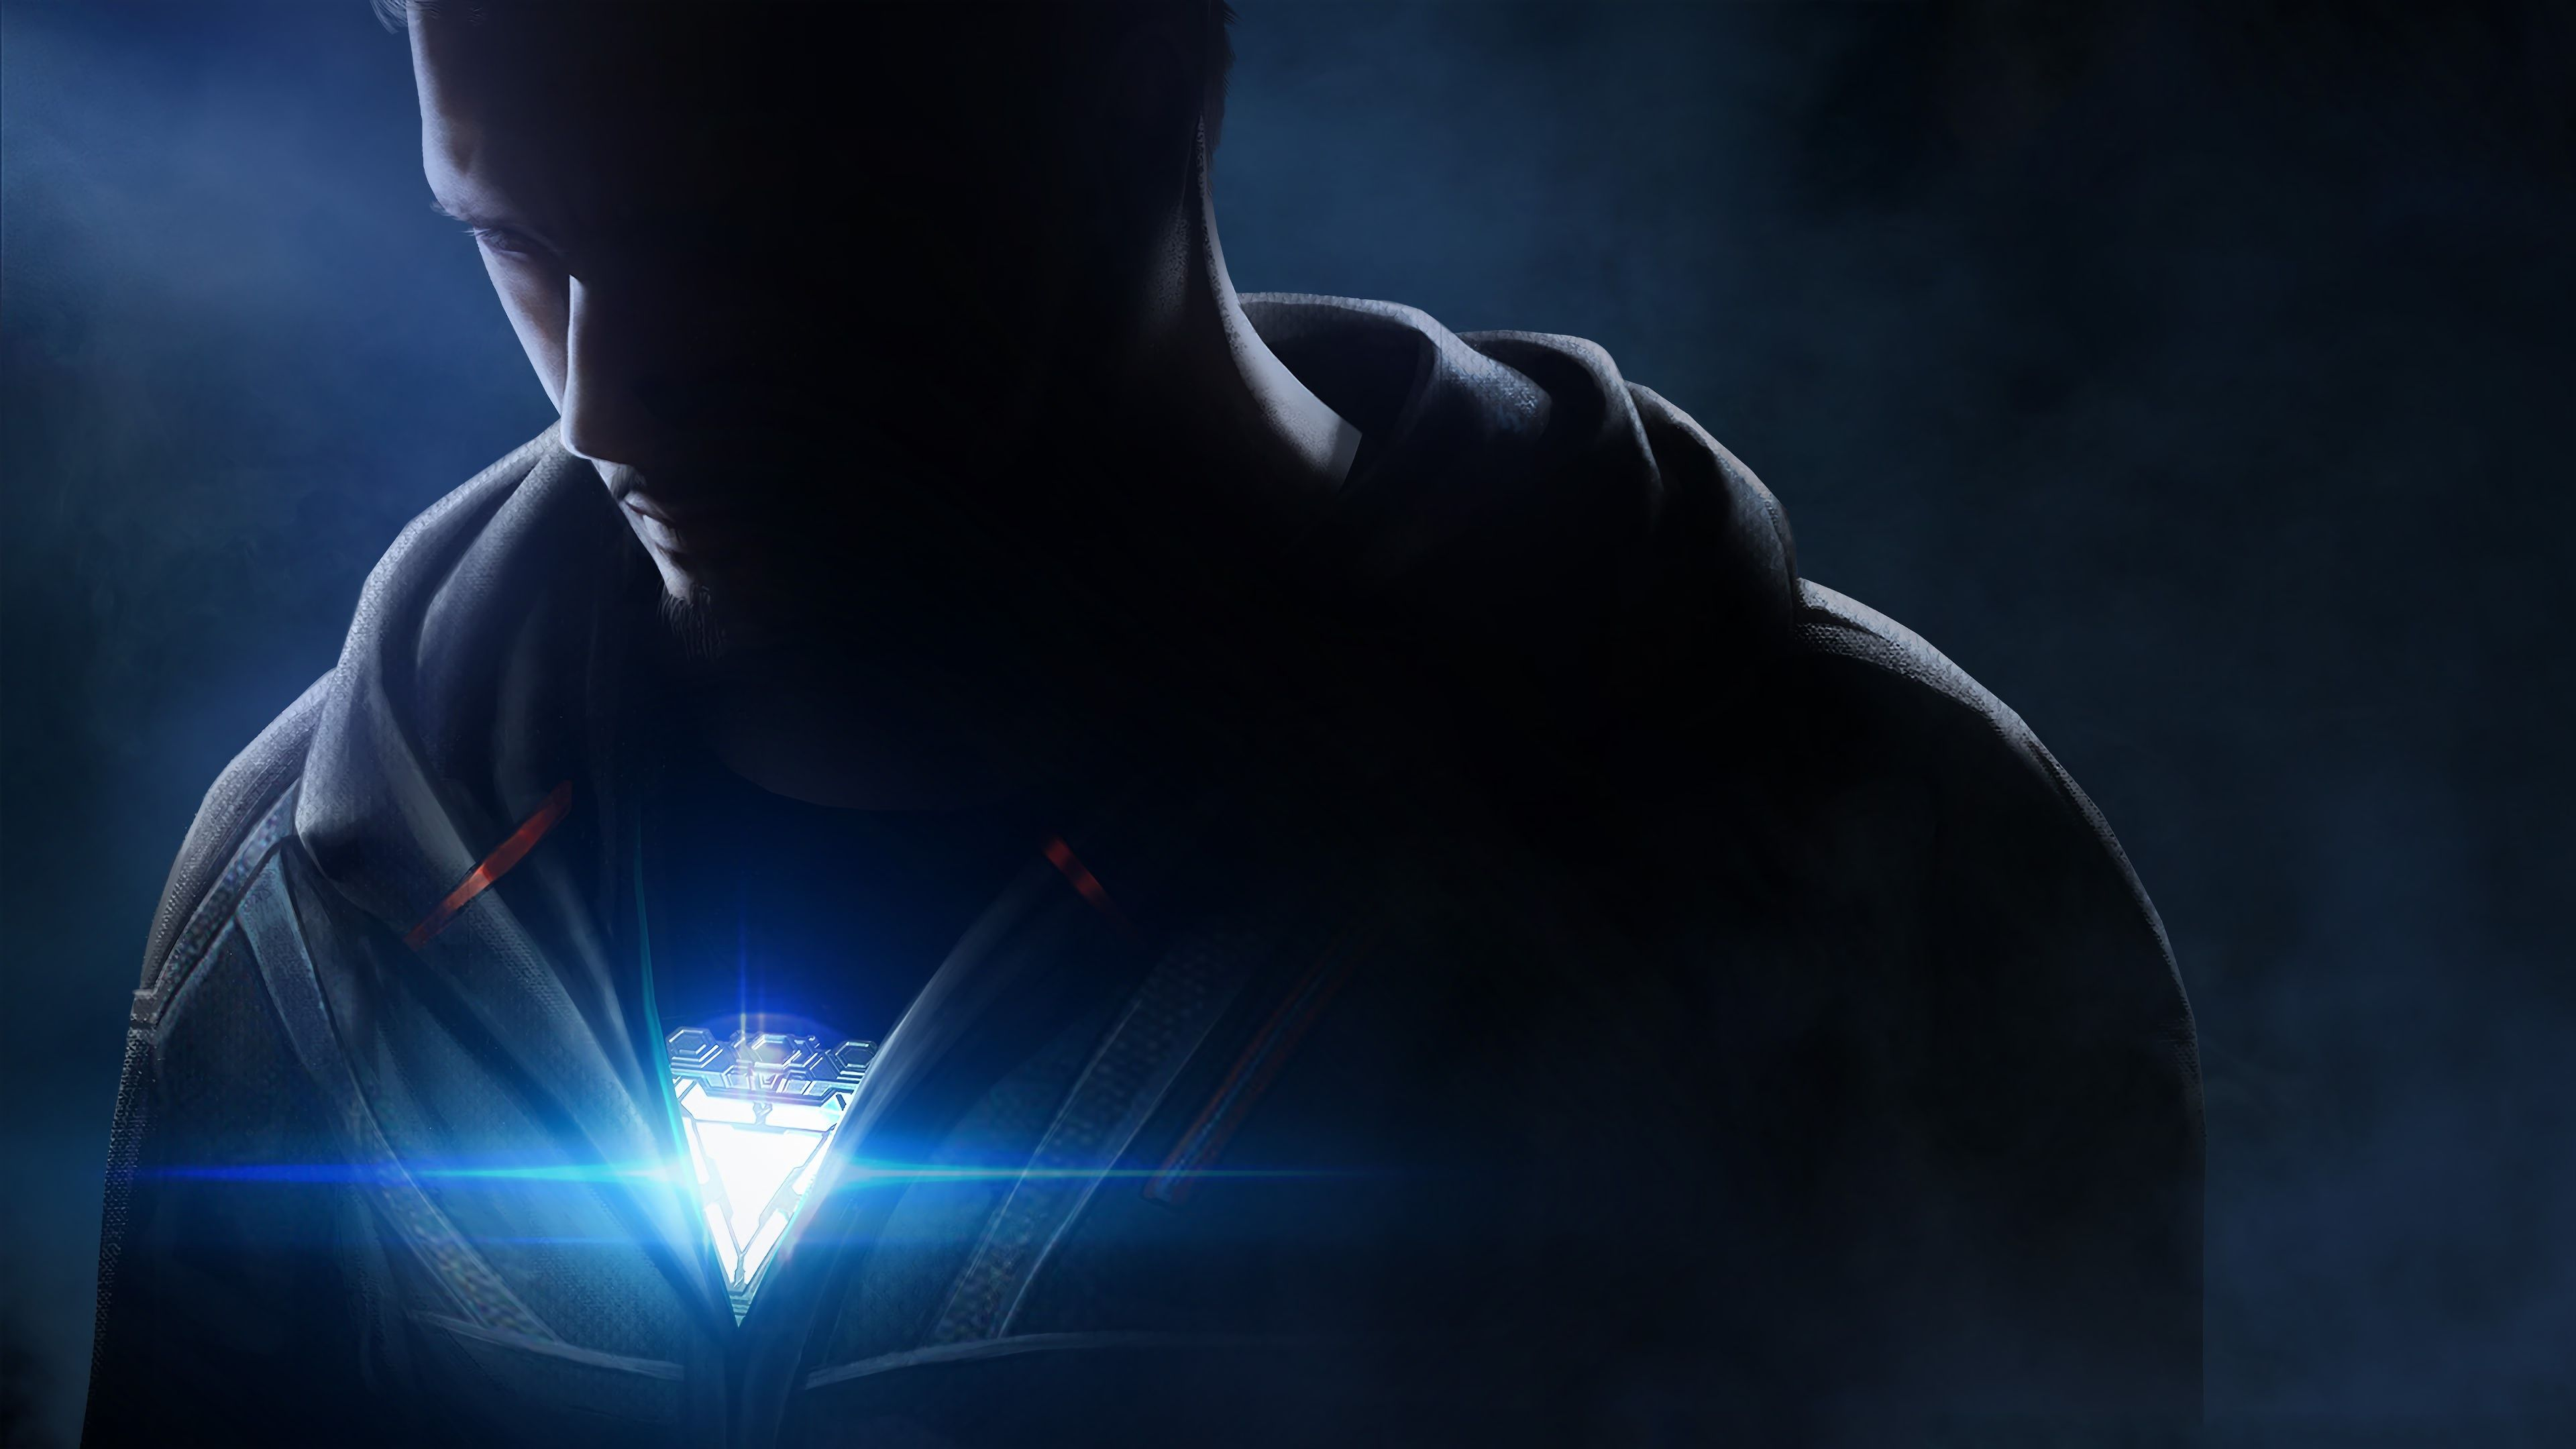 Iron Man Tony Stark Avengers Infinity War 4k 13721 Iron Man Avengers Iron Man Iron Man Tony Stark